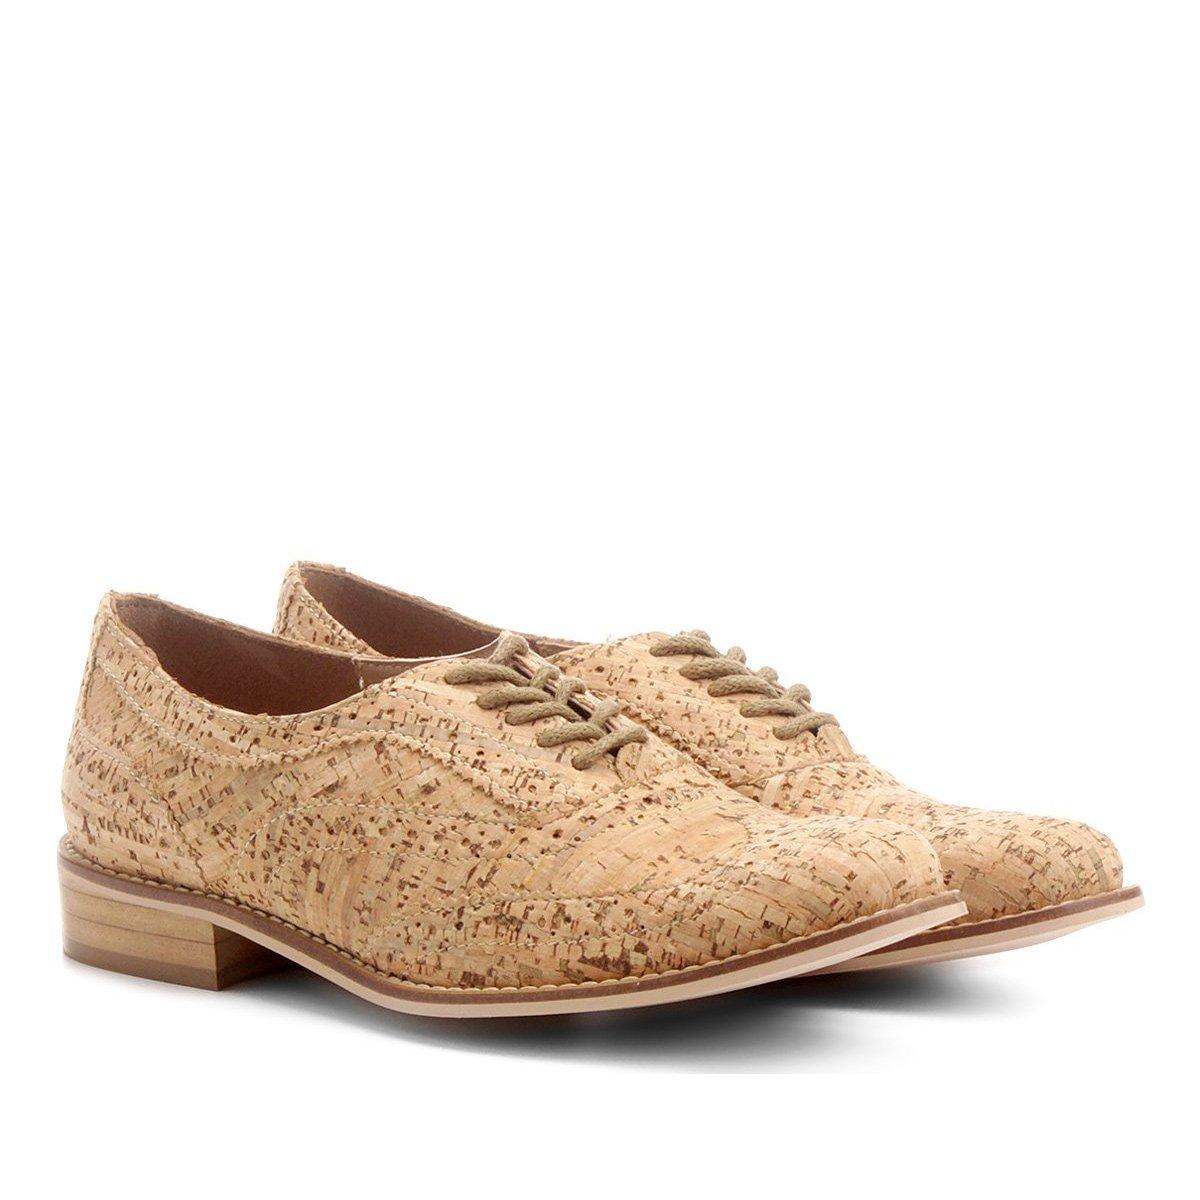 a3218ae396 Oxford Shoestock Cortiça Feminino - Compre Agora